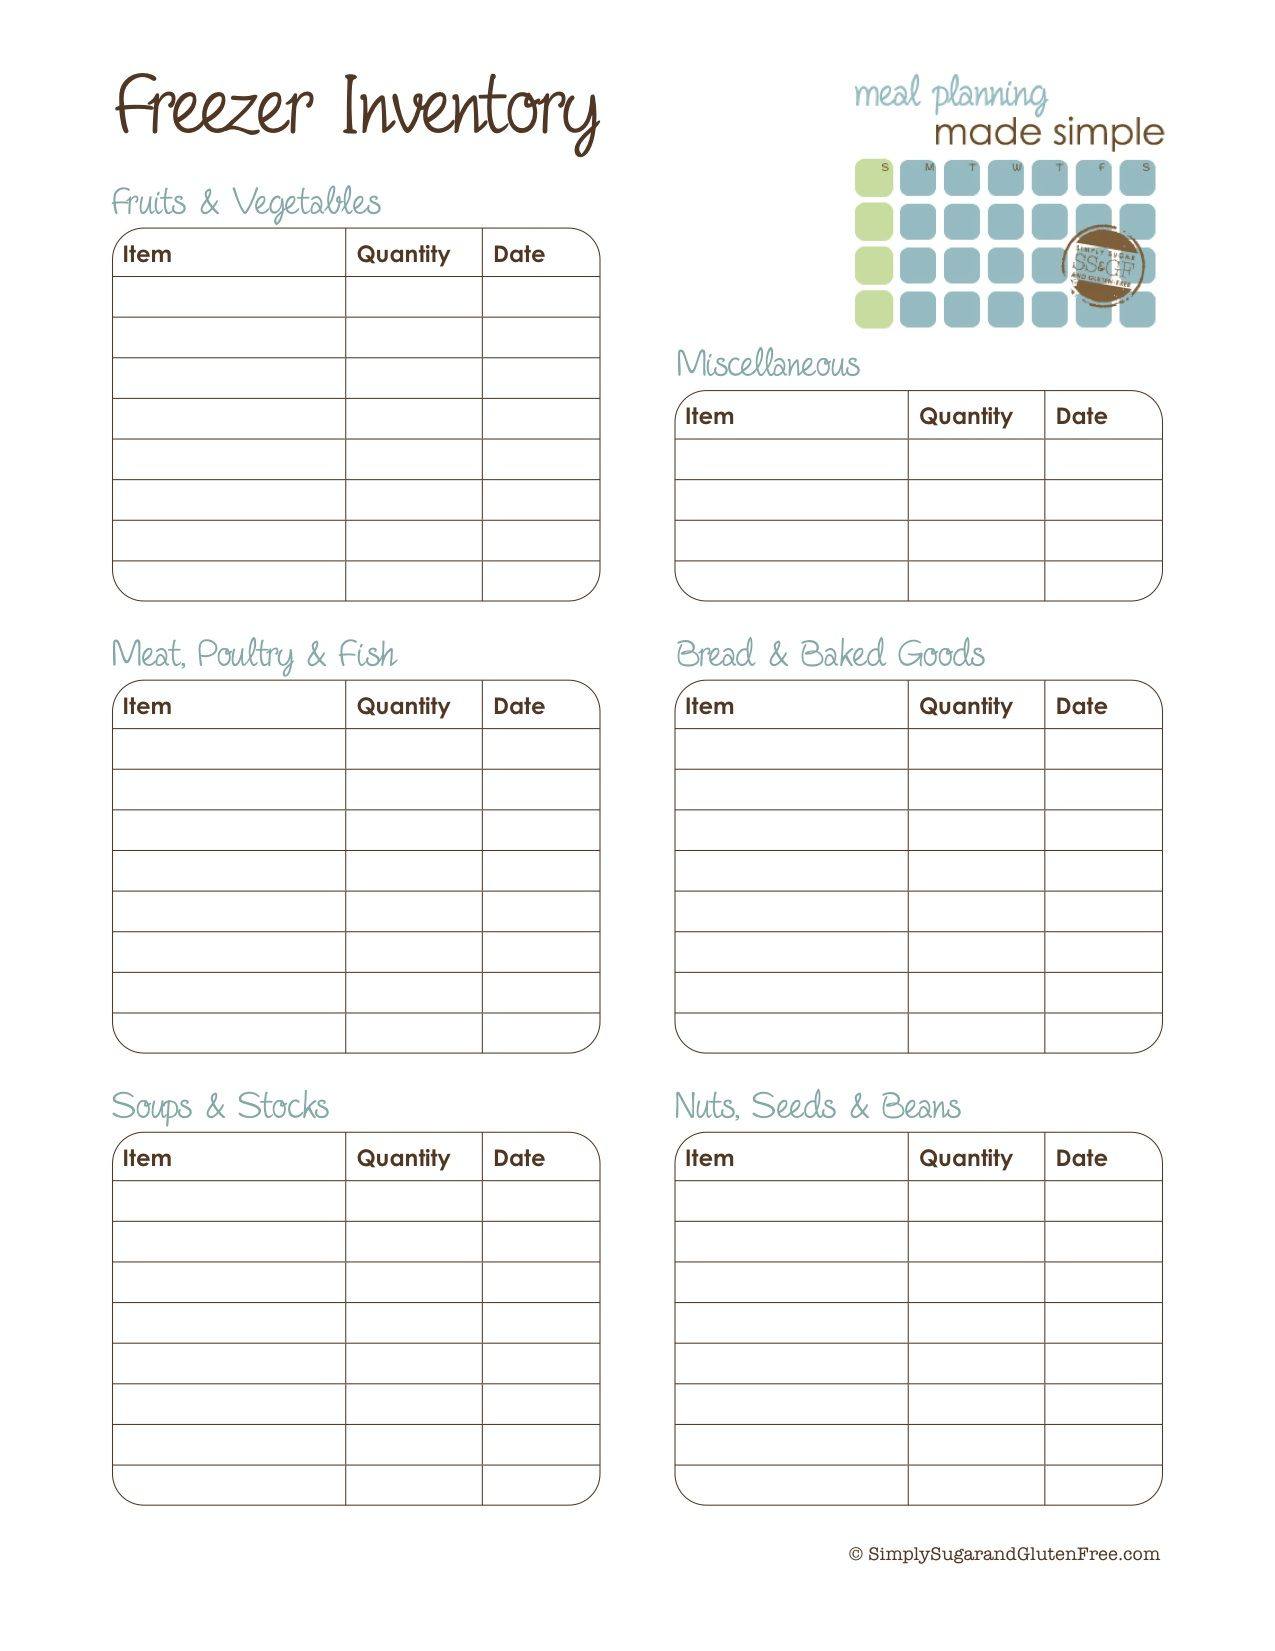 Fitness Food Motivation Printable Freezer Inventory List Freezer Inventory Printable Freezer Meal Planning Workout Food